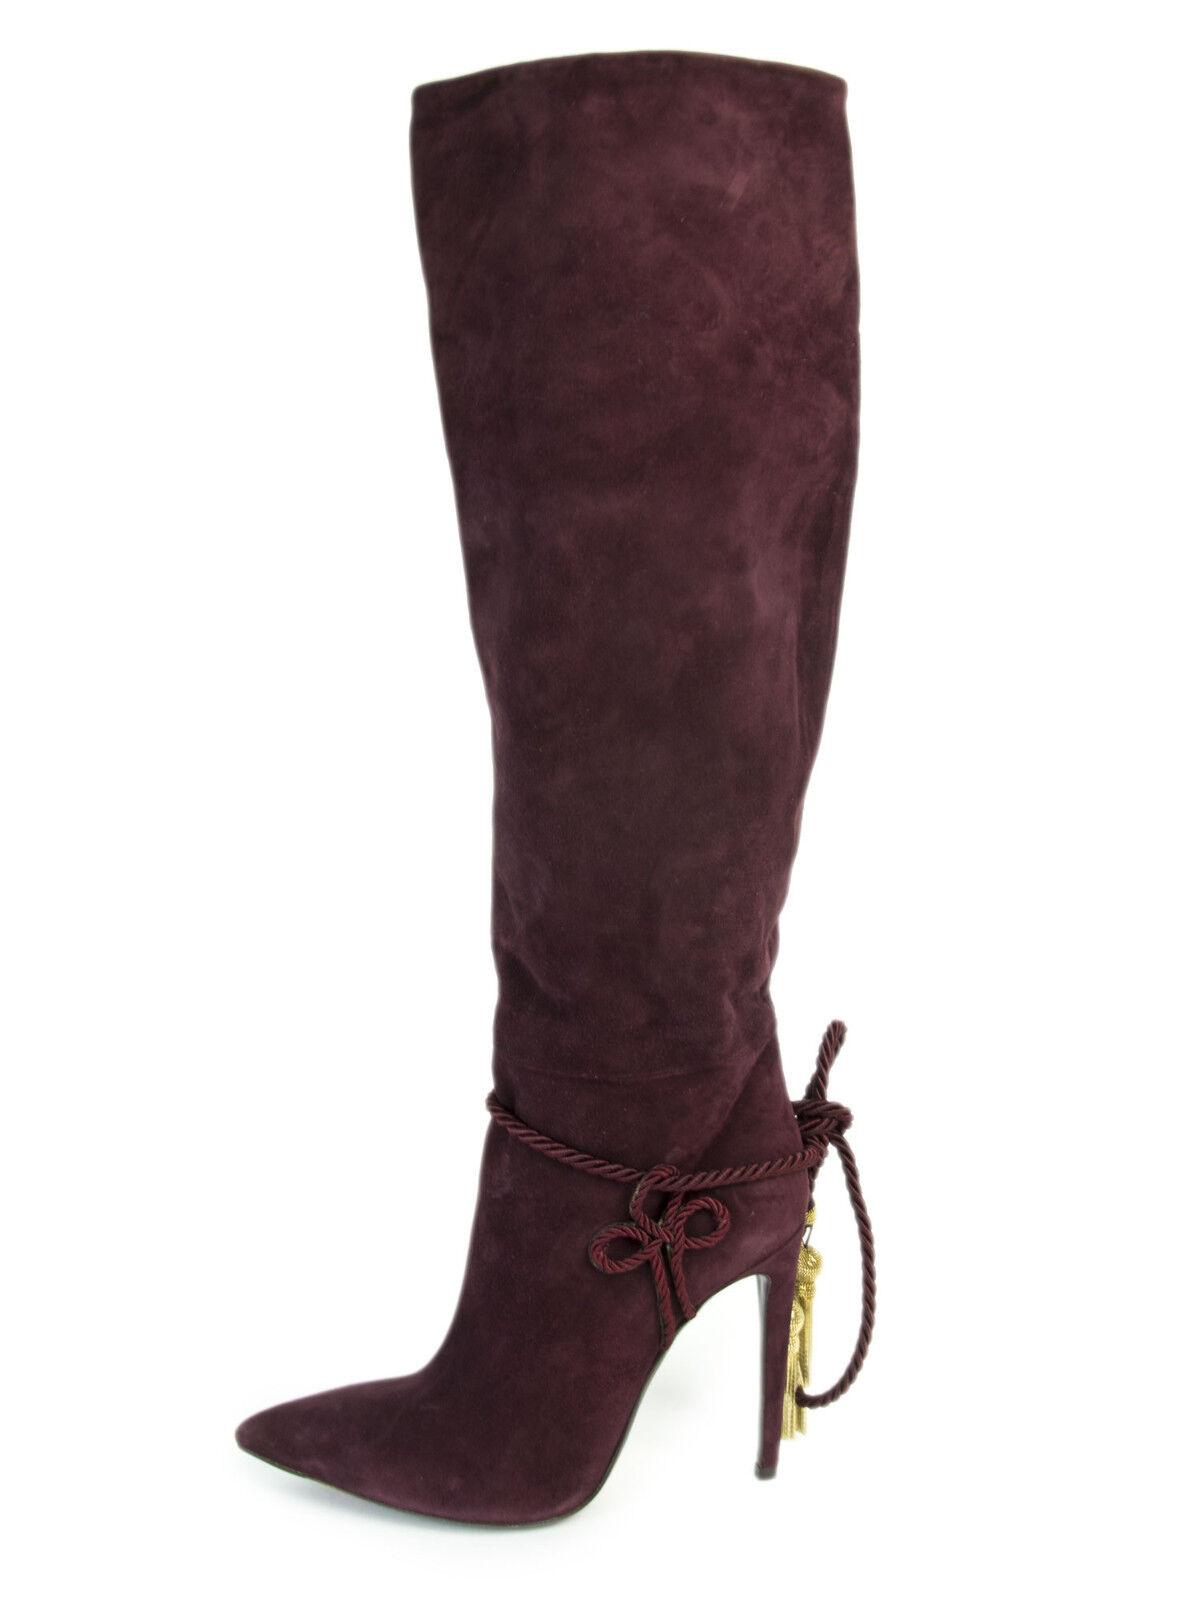 RALPH LAUREN lila Label Label Label Talisse Bordeaux Suede Tassel Stiefel Sz 8  1,500 NEW 7cfe13